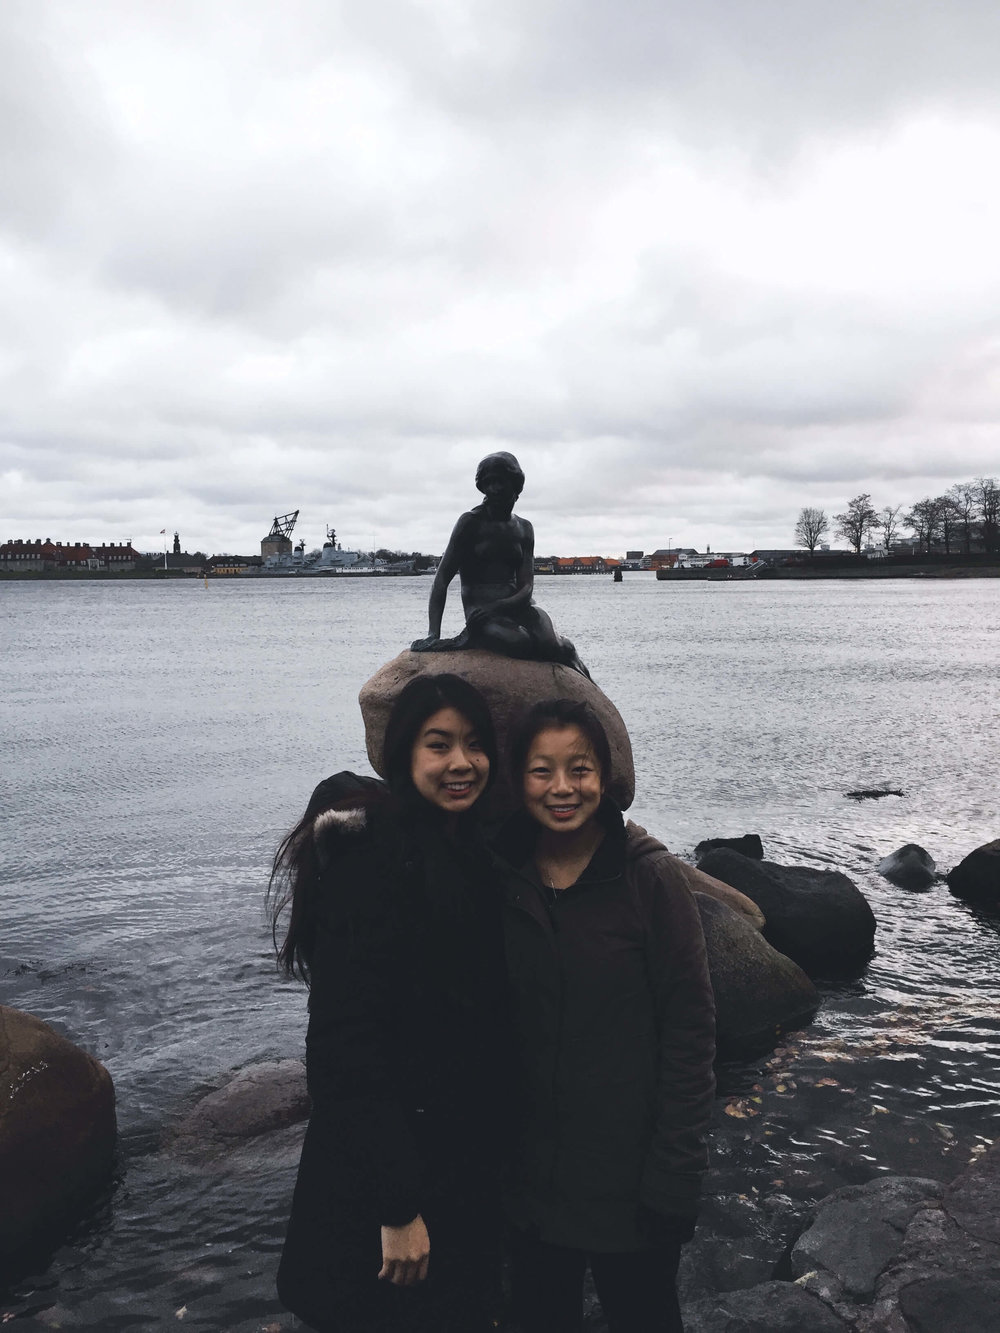 In front of the famous Little Mermaid in Copenhagen